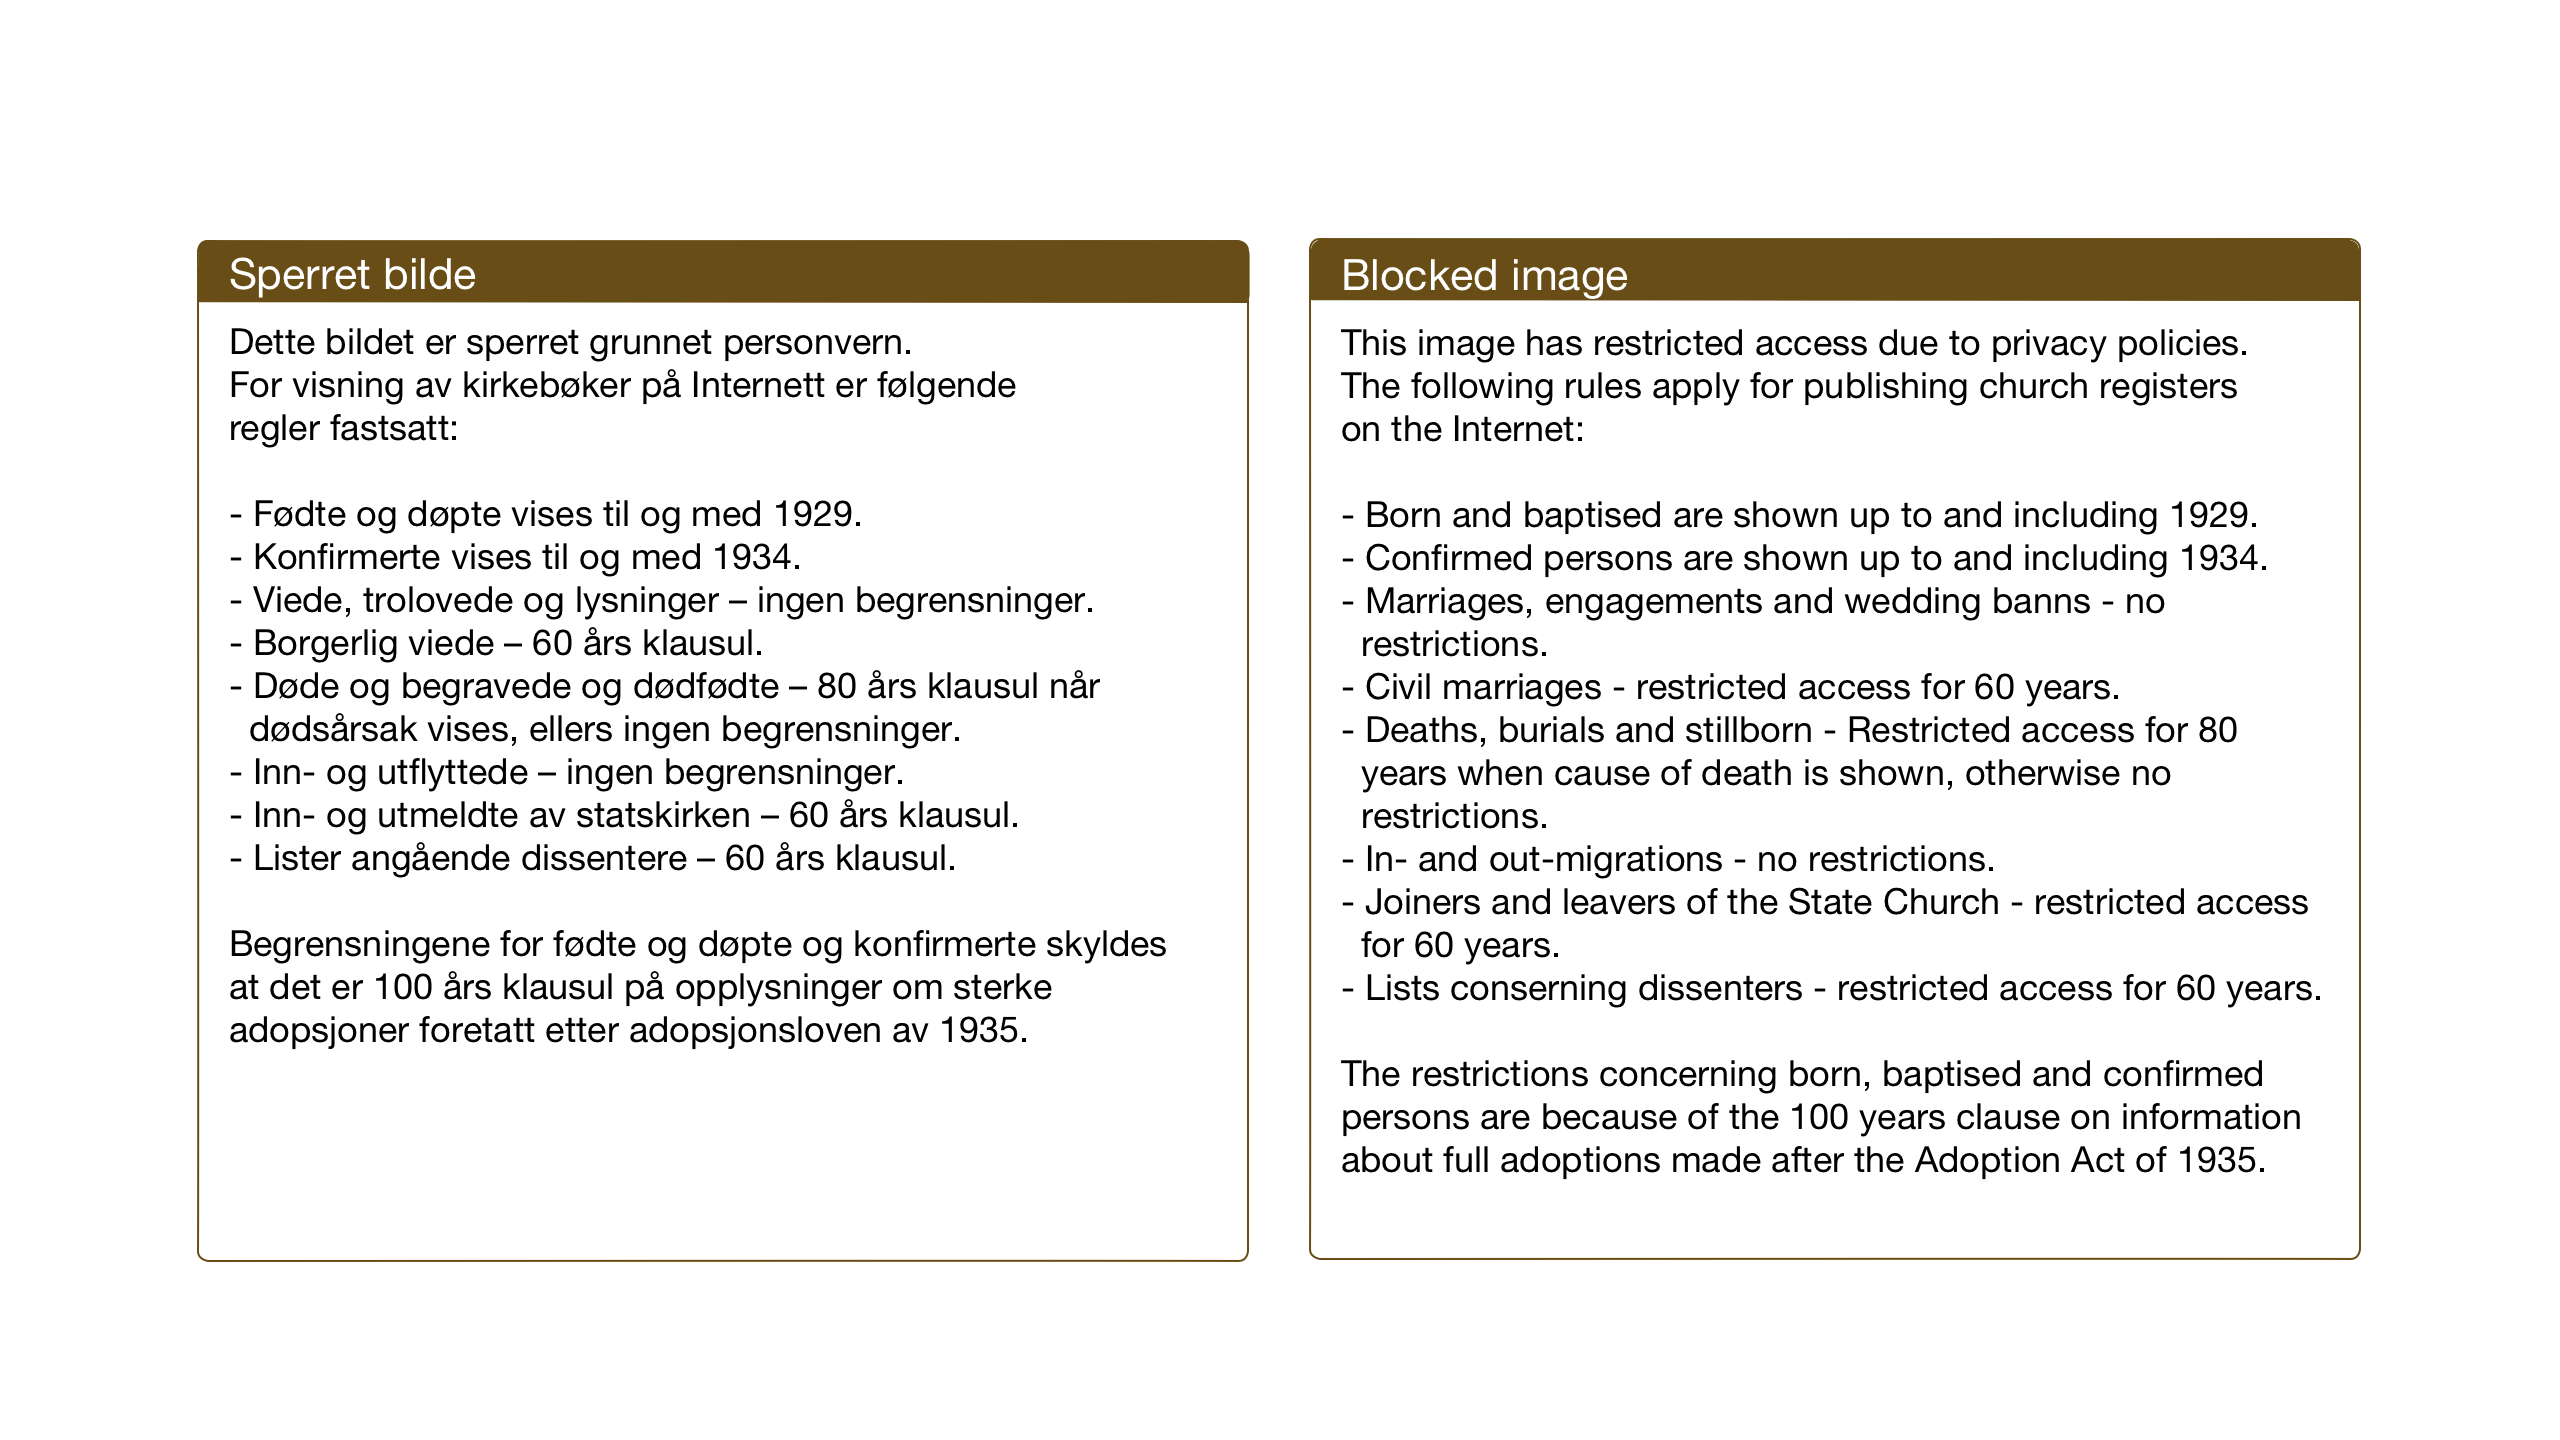 SAT, Ministerialprotokoller, klokkerbøker og fødselsregistre - Nordland, 884/L1194: Ministerialbok nr. 884A02, 1906-1937, s. 57